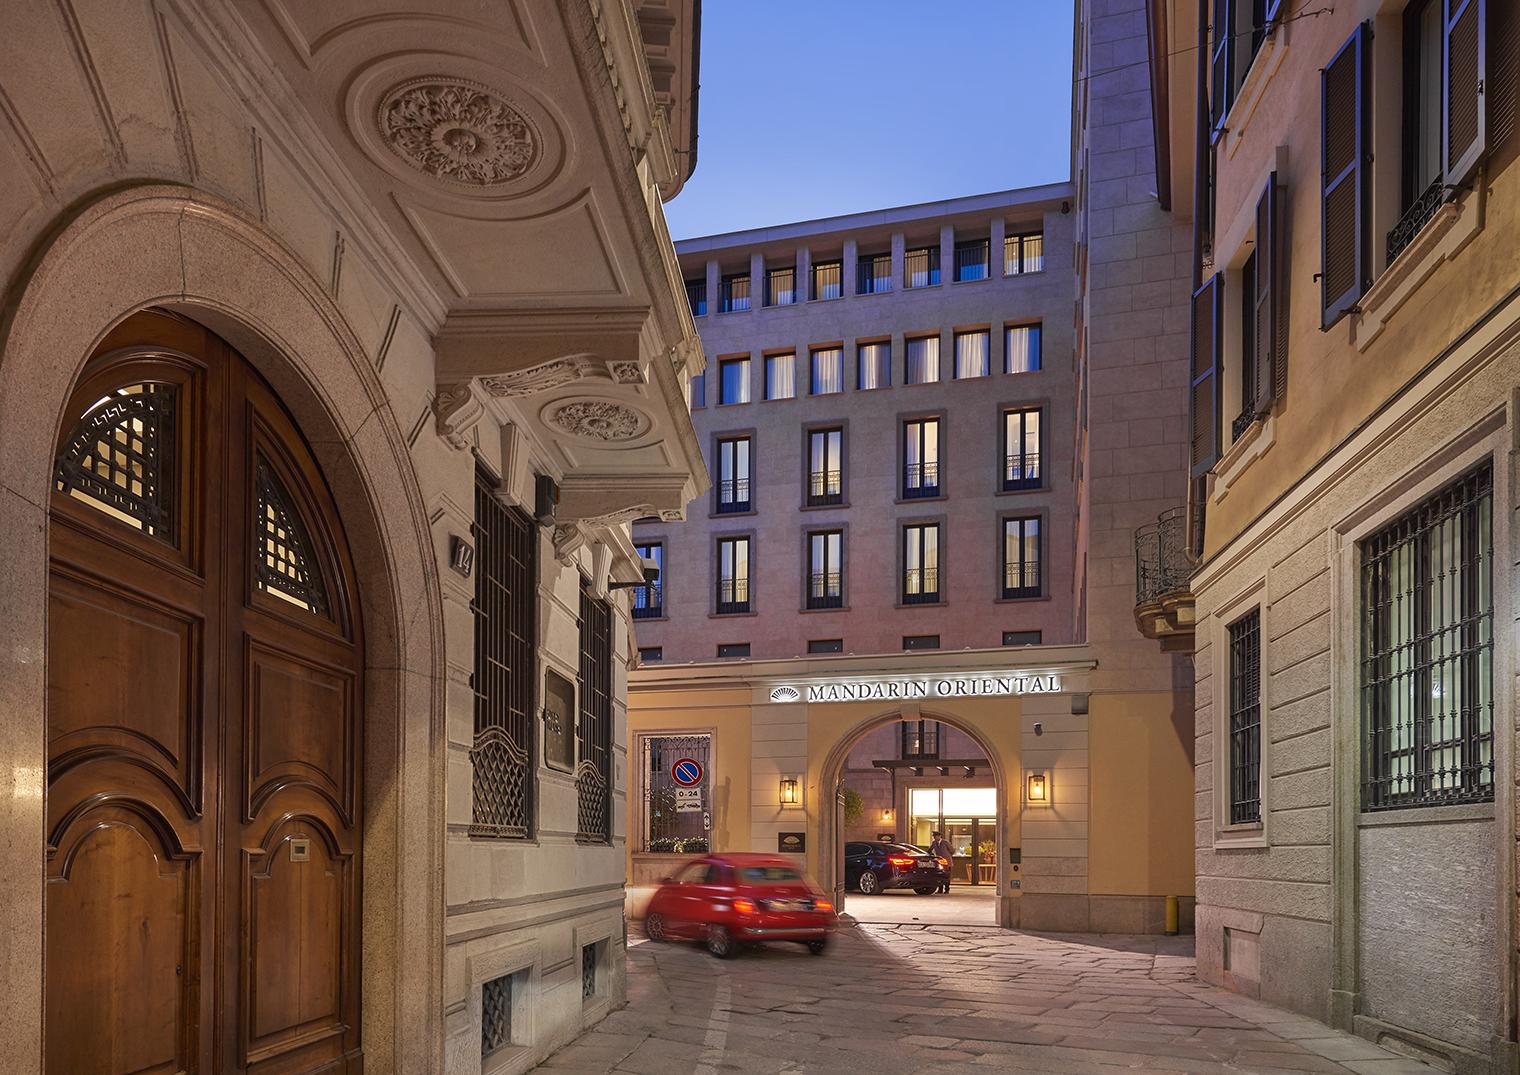 Mandarin oriental dise o citterio el nuevo punto de for Arquitectura de hoteles